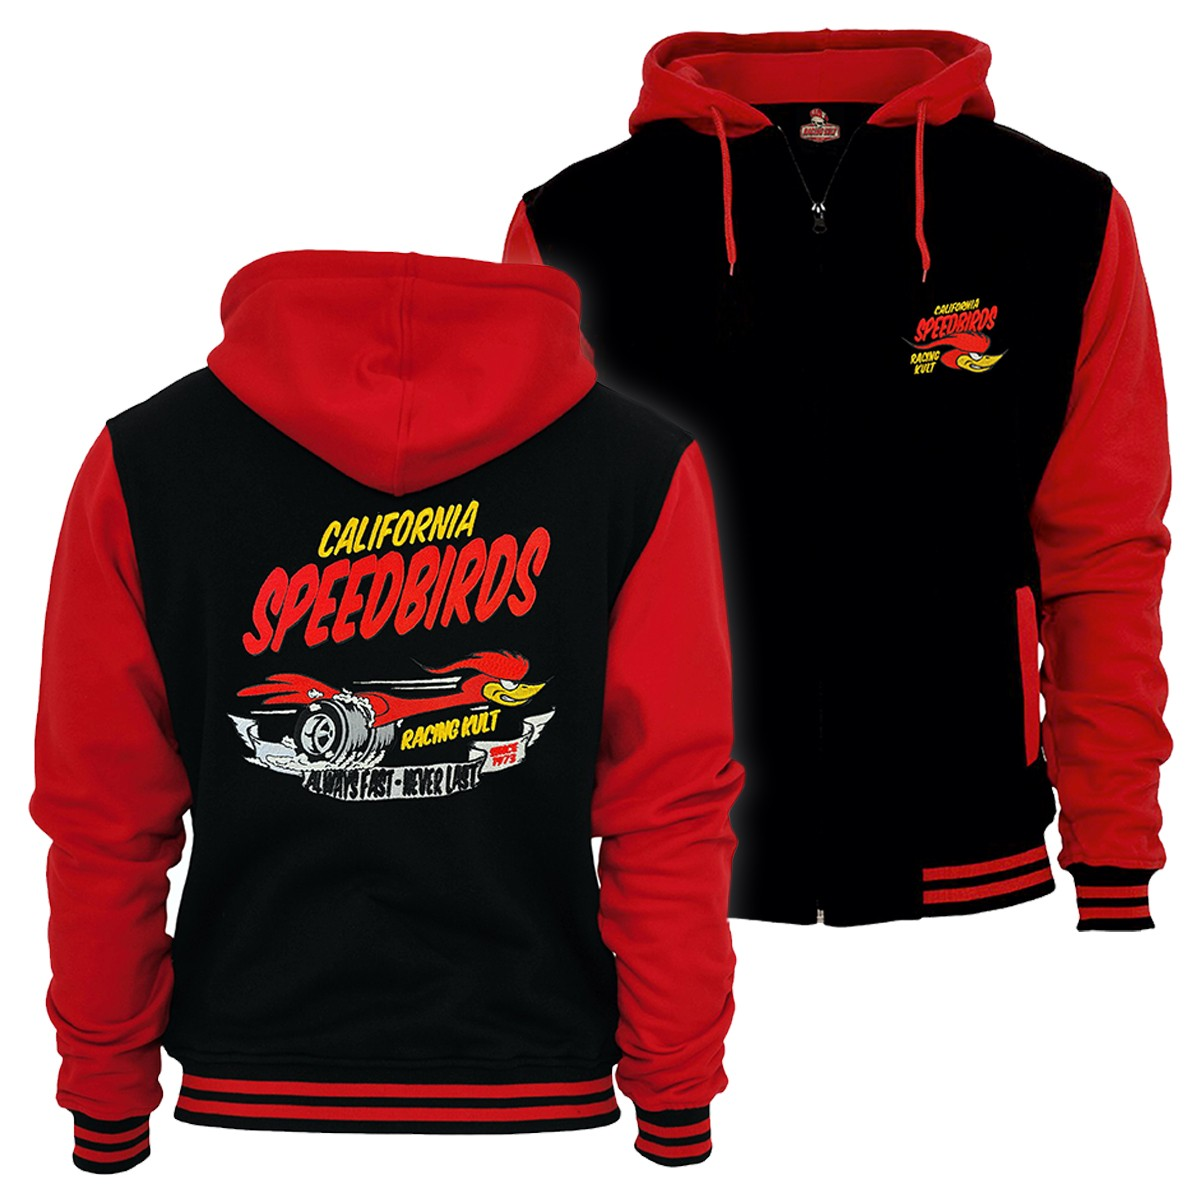 Racing Kult 2-Ton Sweatjacke im College Look Speedbird mit Stick